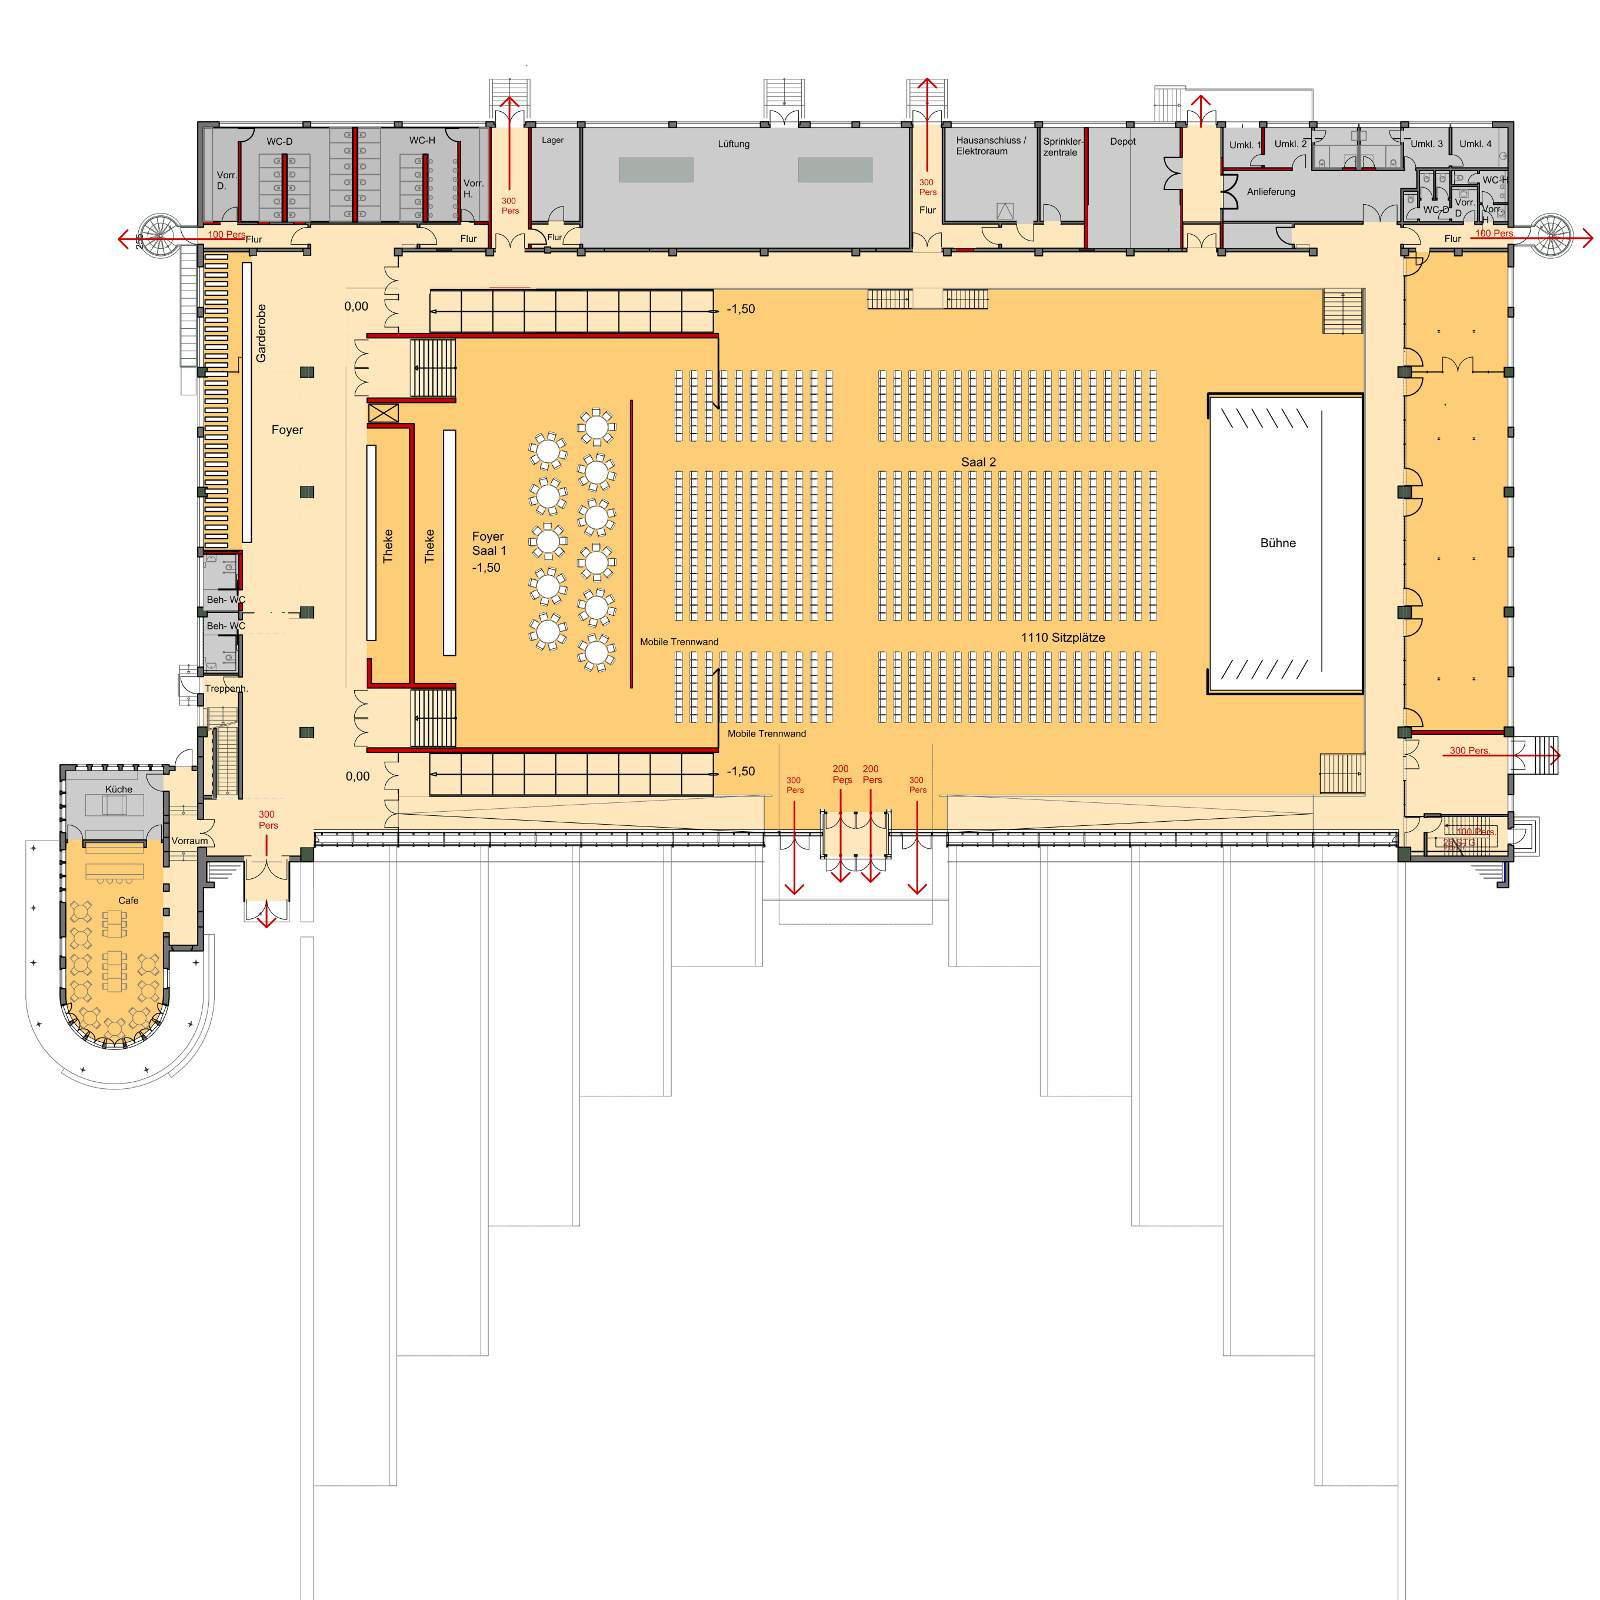 Hangar 21 . Detmold